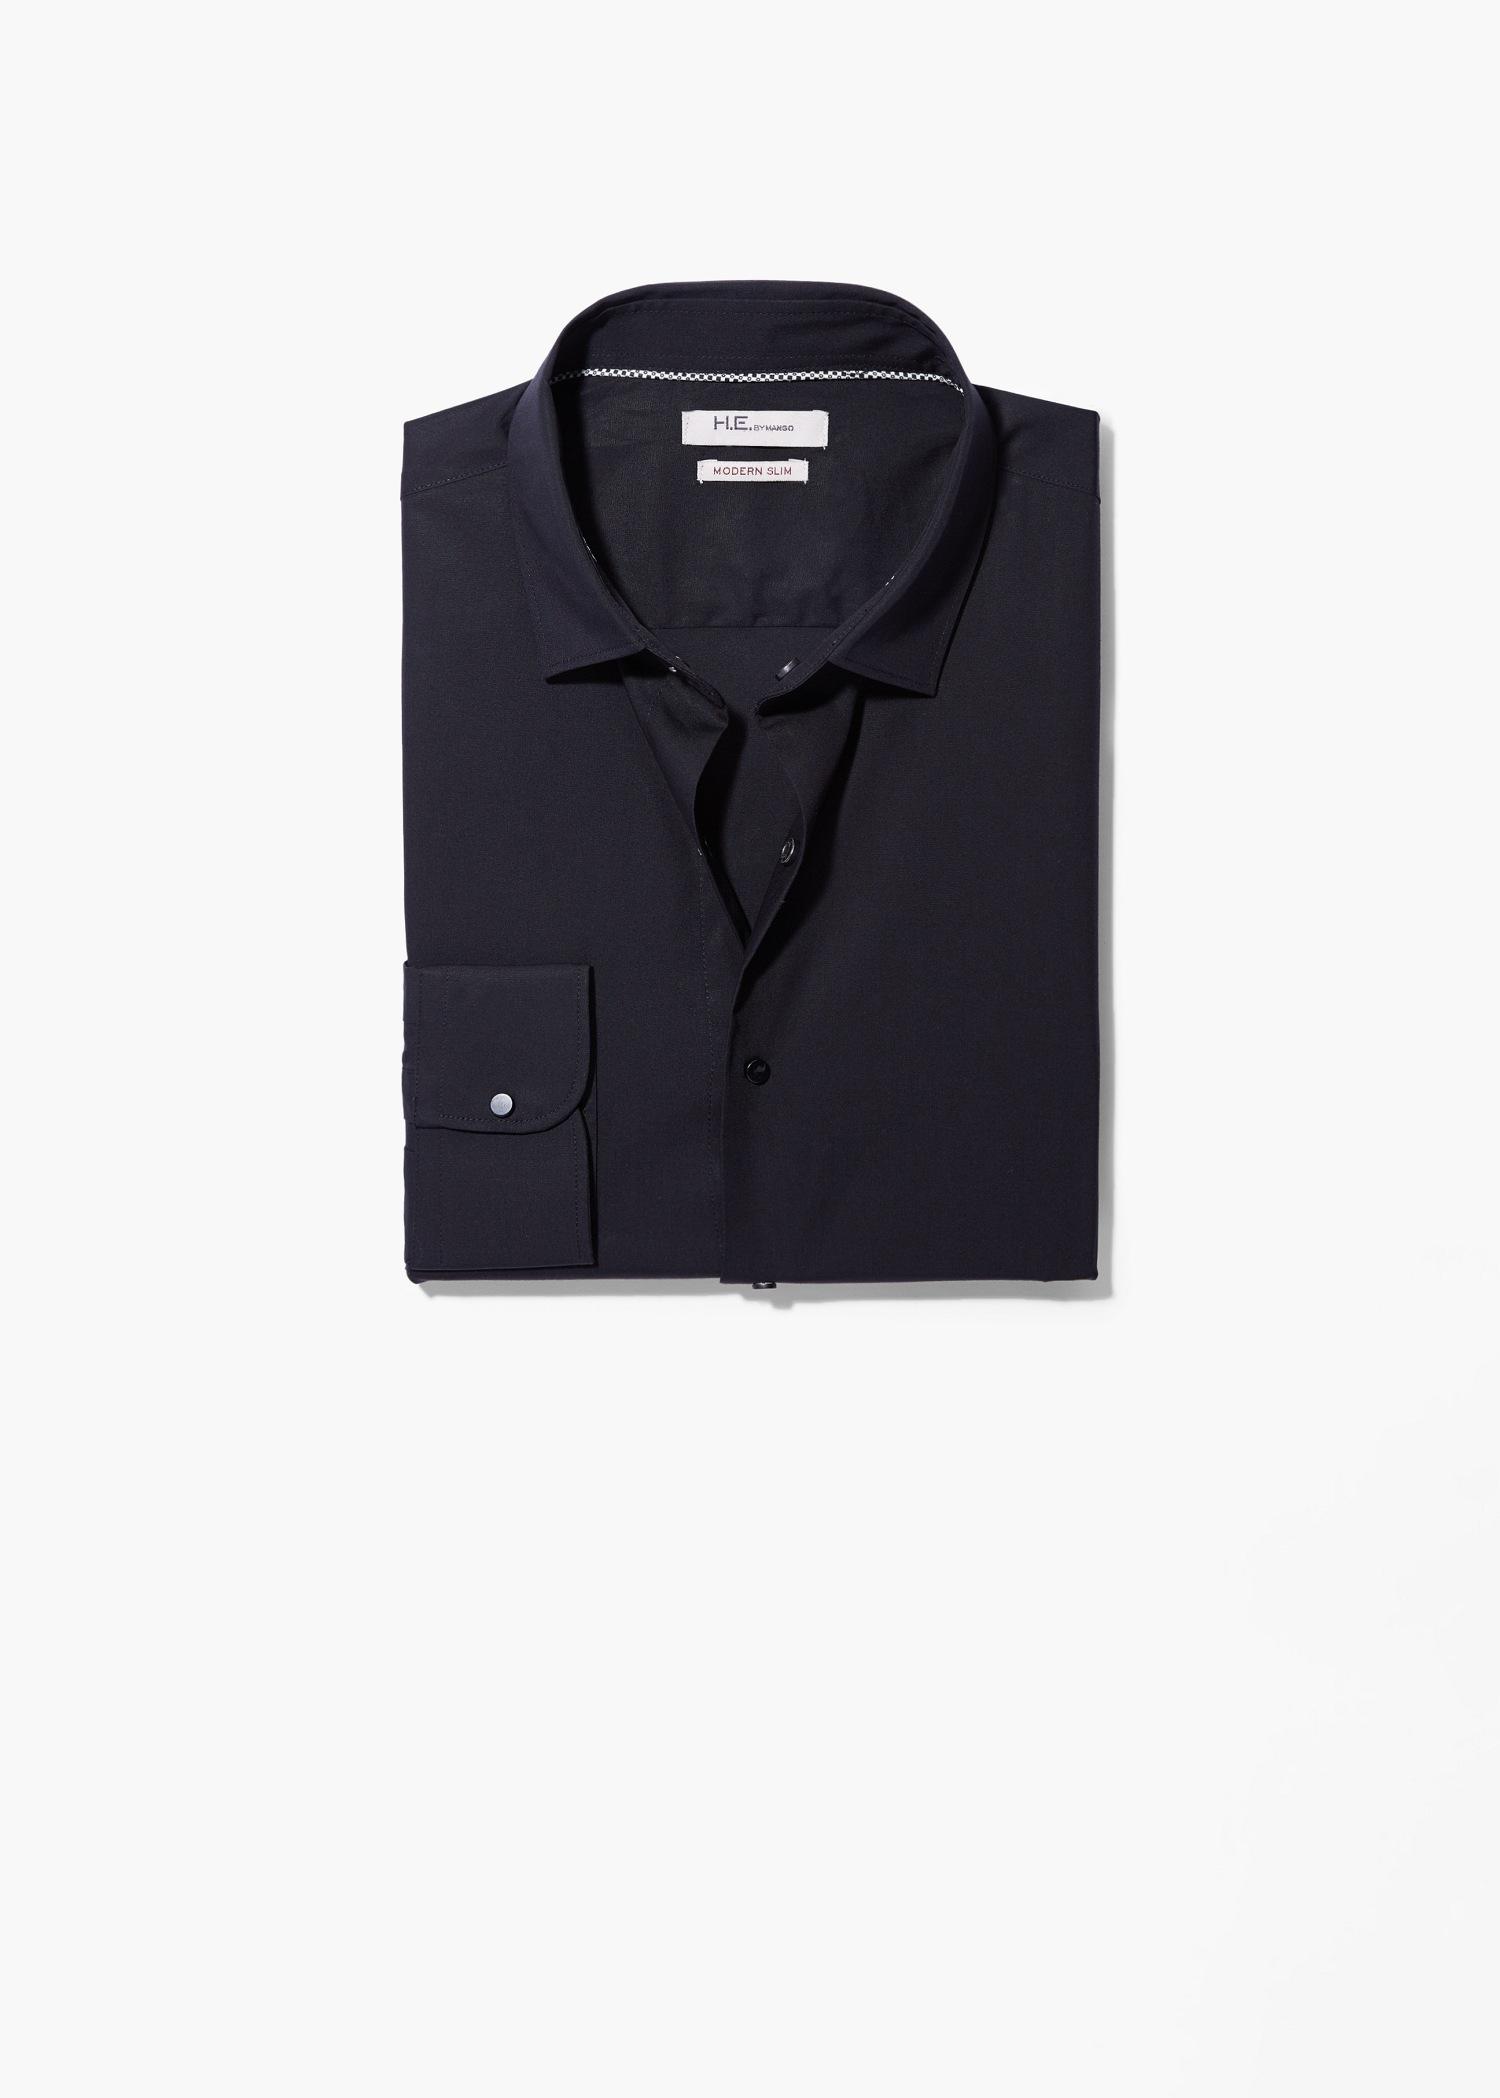 Lyst Mango Modern Slim Fit Cotton Shirt In Black For Men